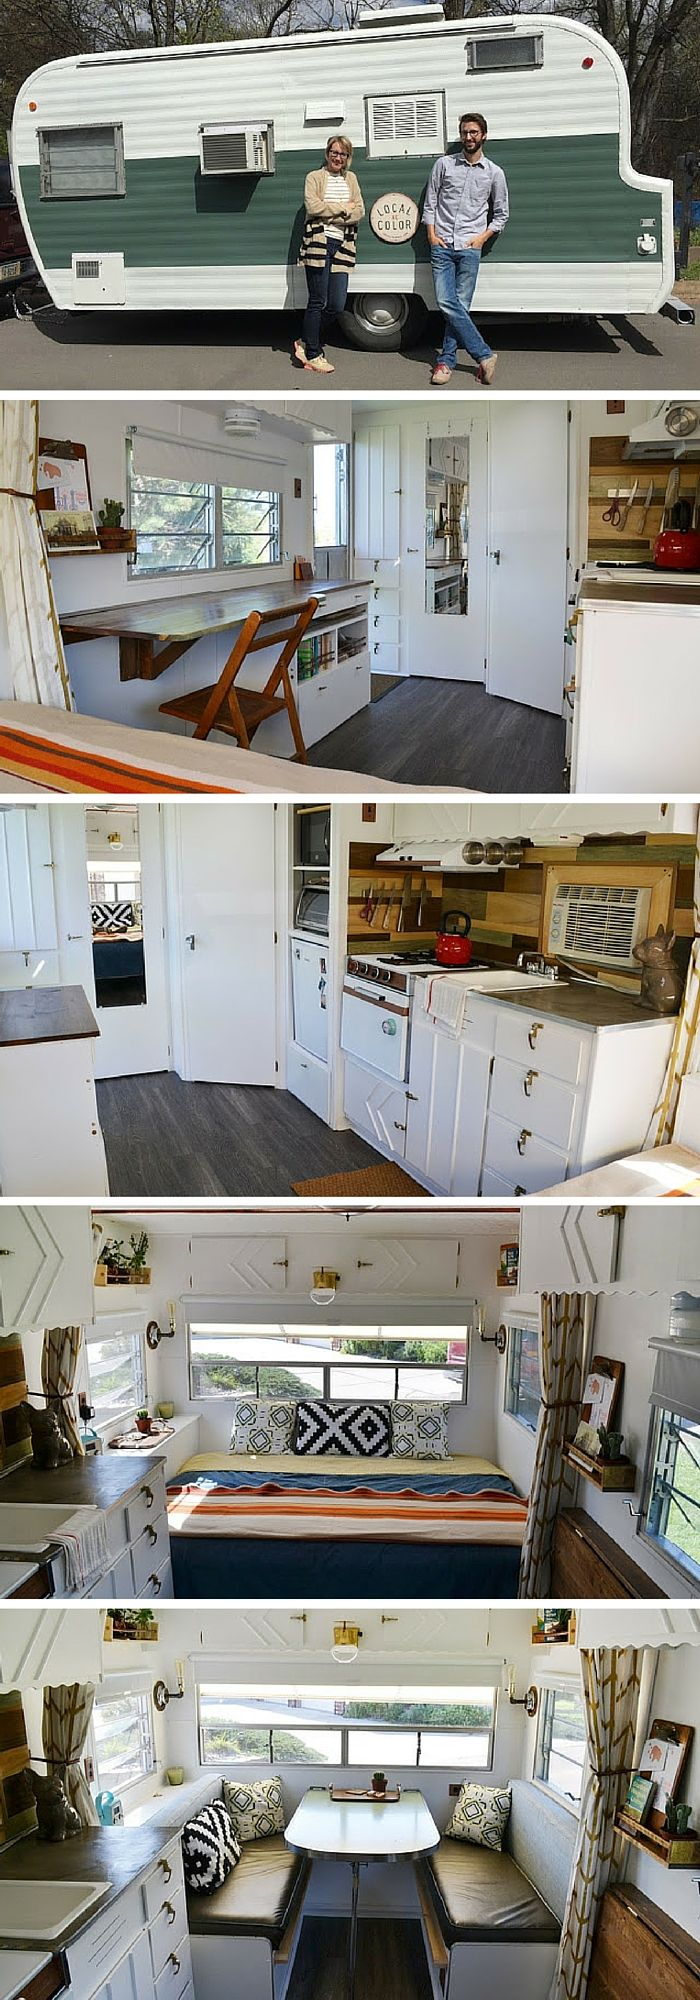 312 best RV Decorating Ideas images on Pinterest  Caravan Gypsy caravan and Mobile home